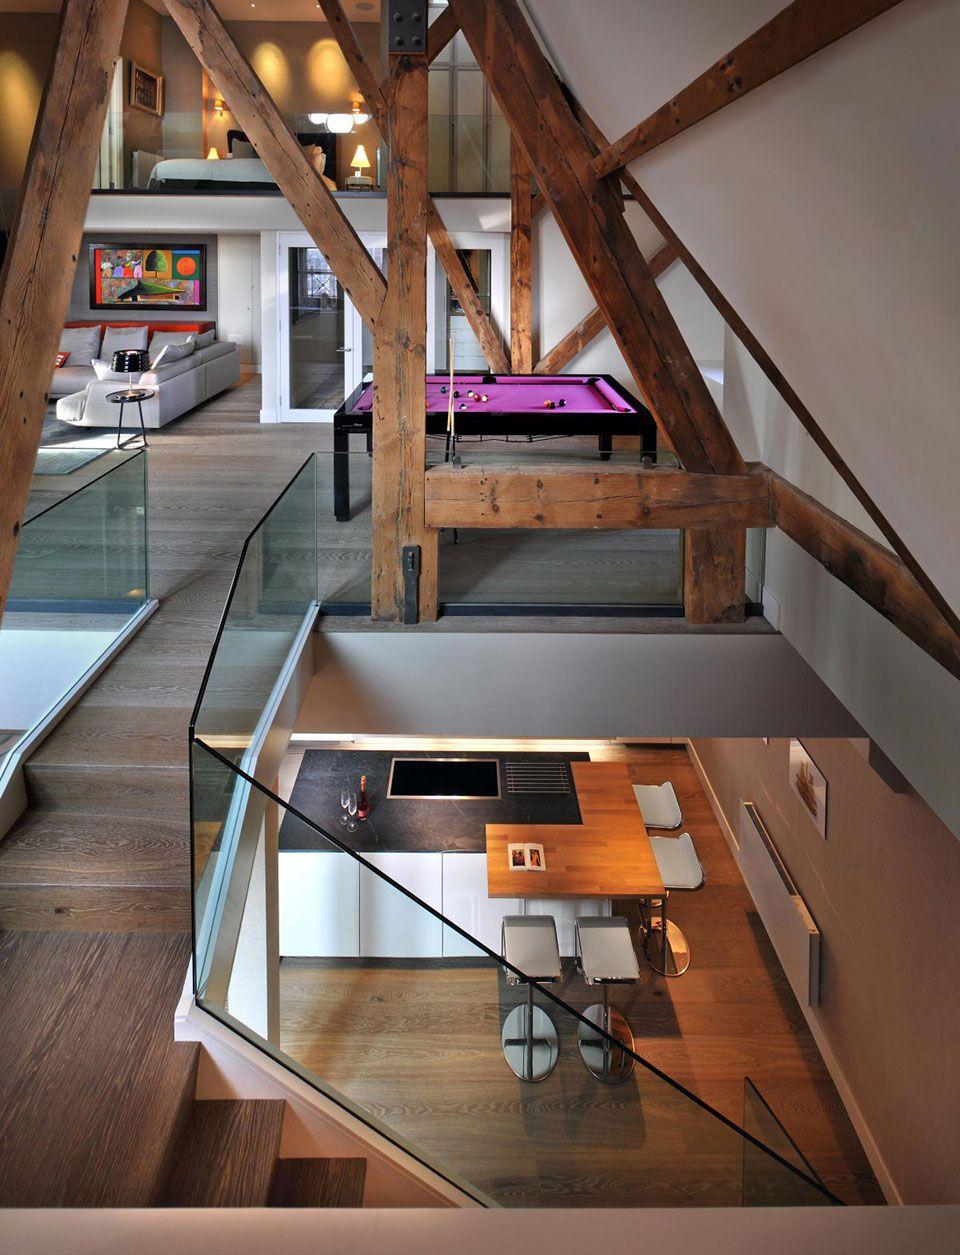 published on july 24 2013 by pierre london penthouse architektur ...